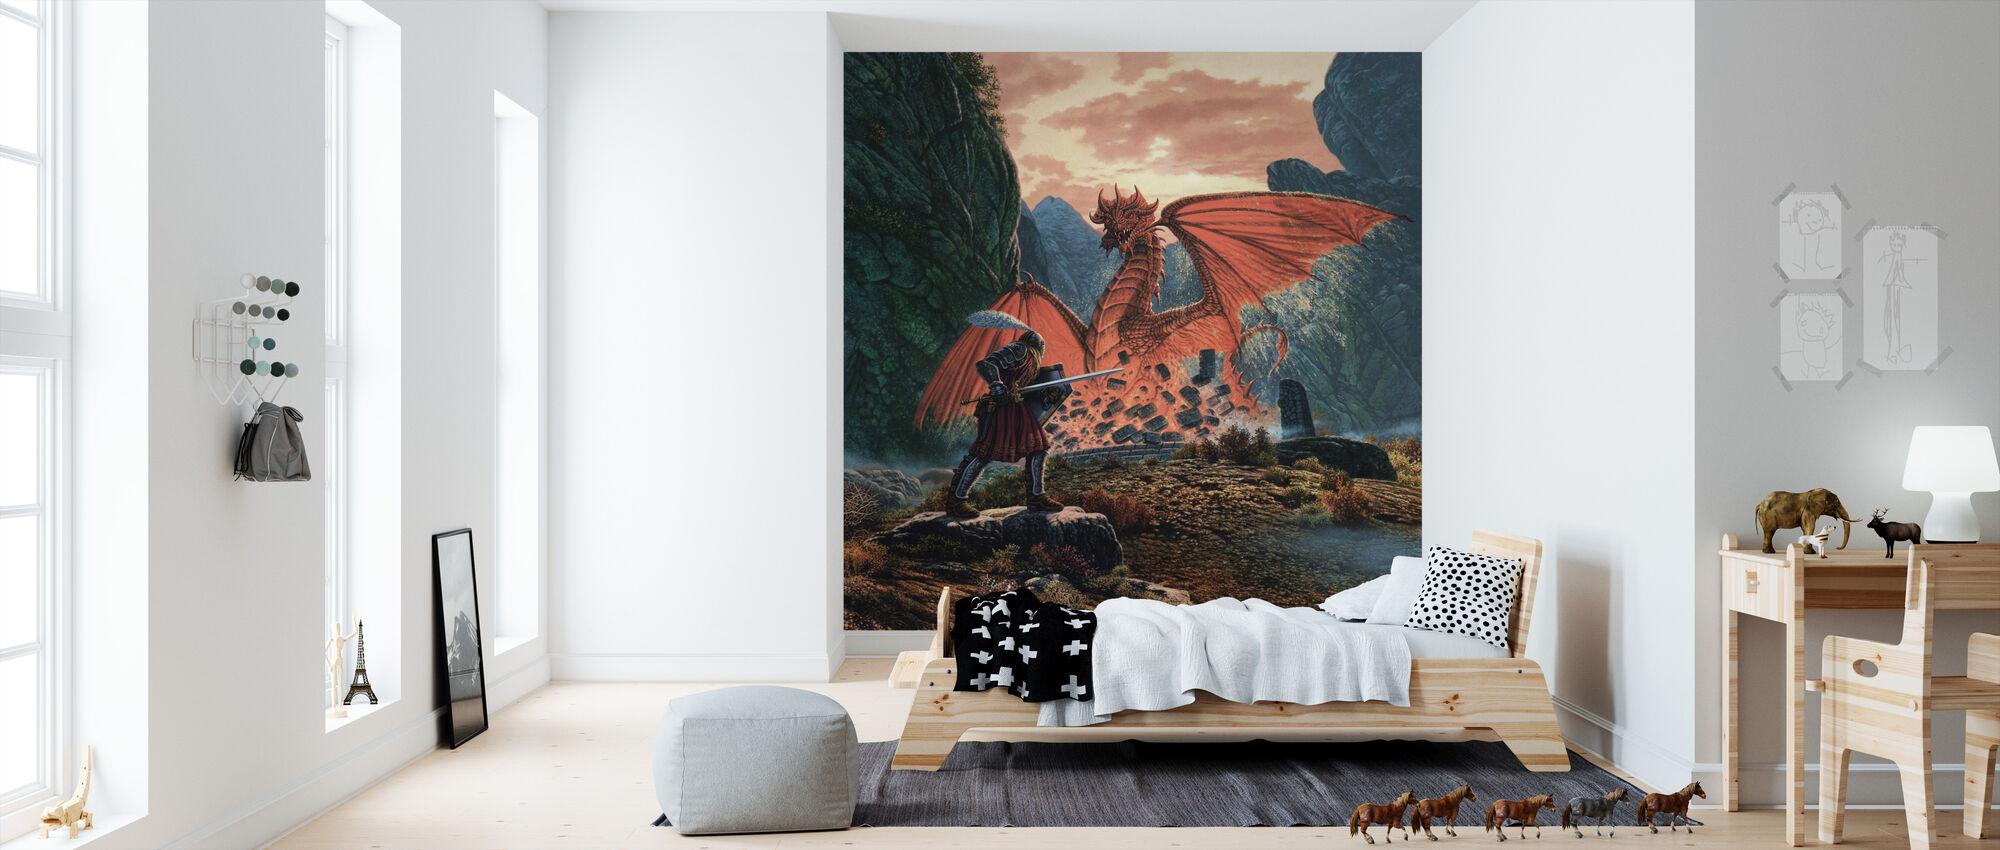 Red Dragon Awakens - Wallpaper - Kids Room